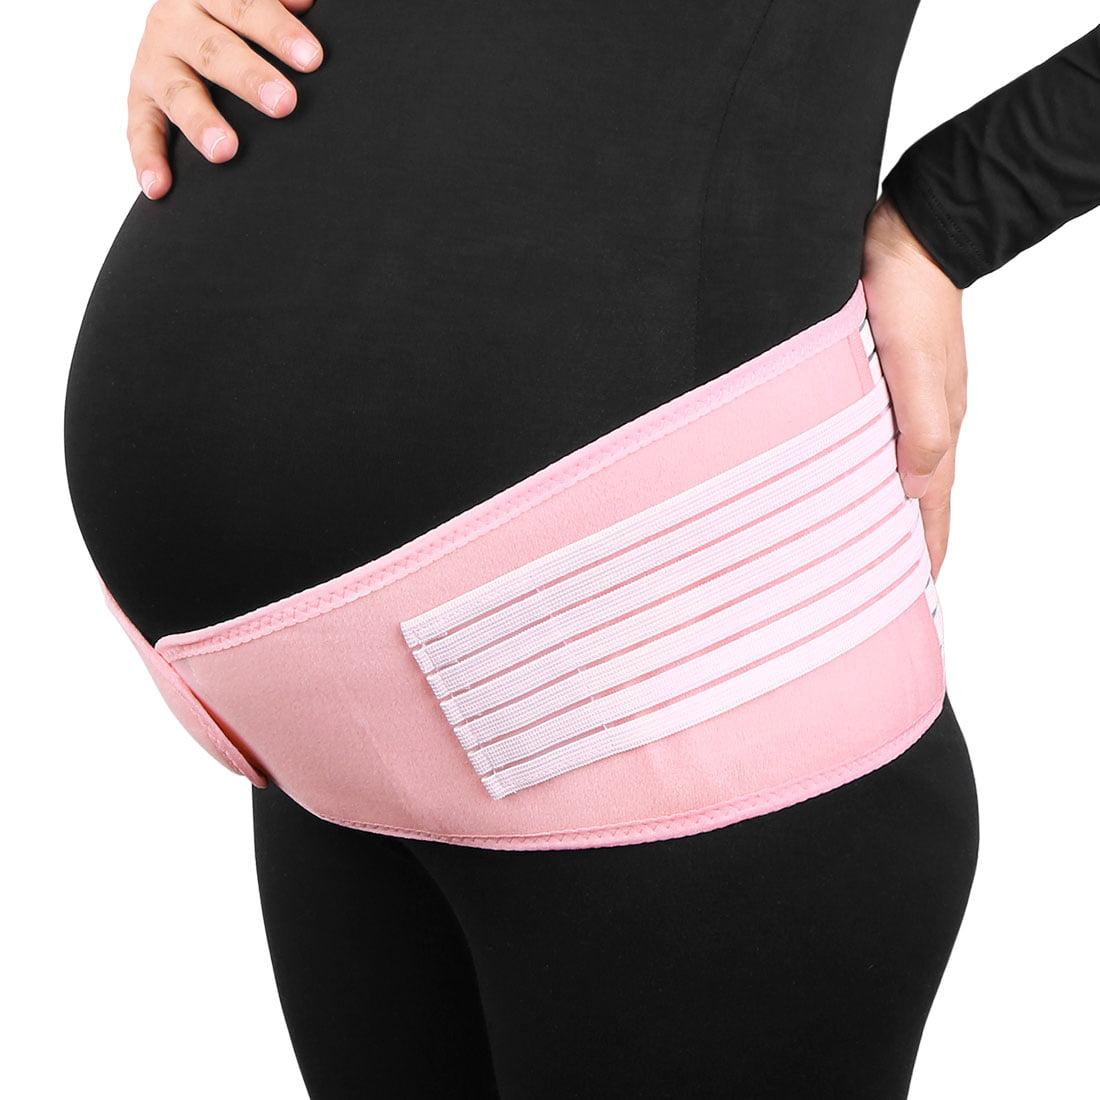 One  Prenatal Maternity Pregnancy Support Belt Abdominal Waist Belly Brace